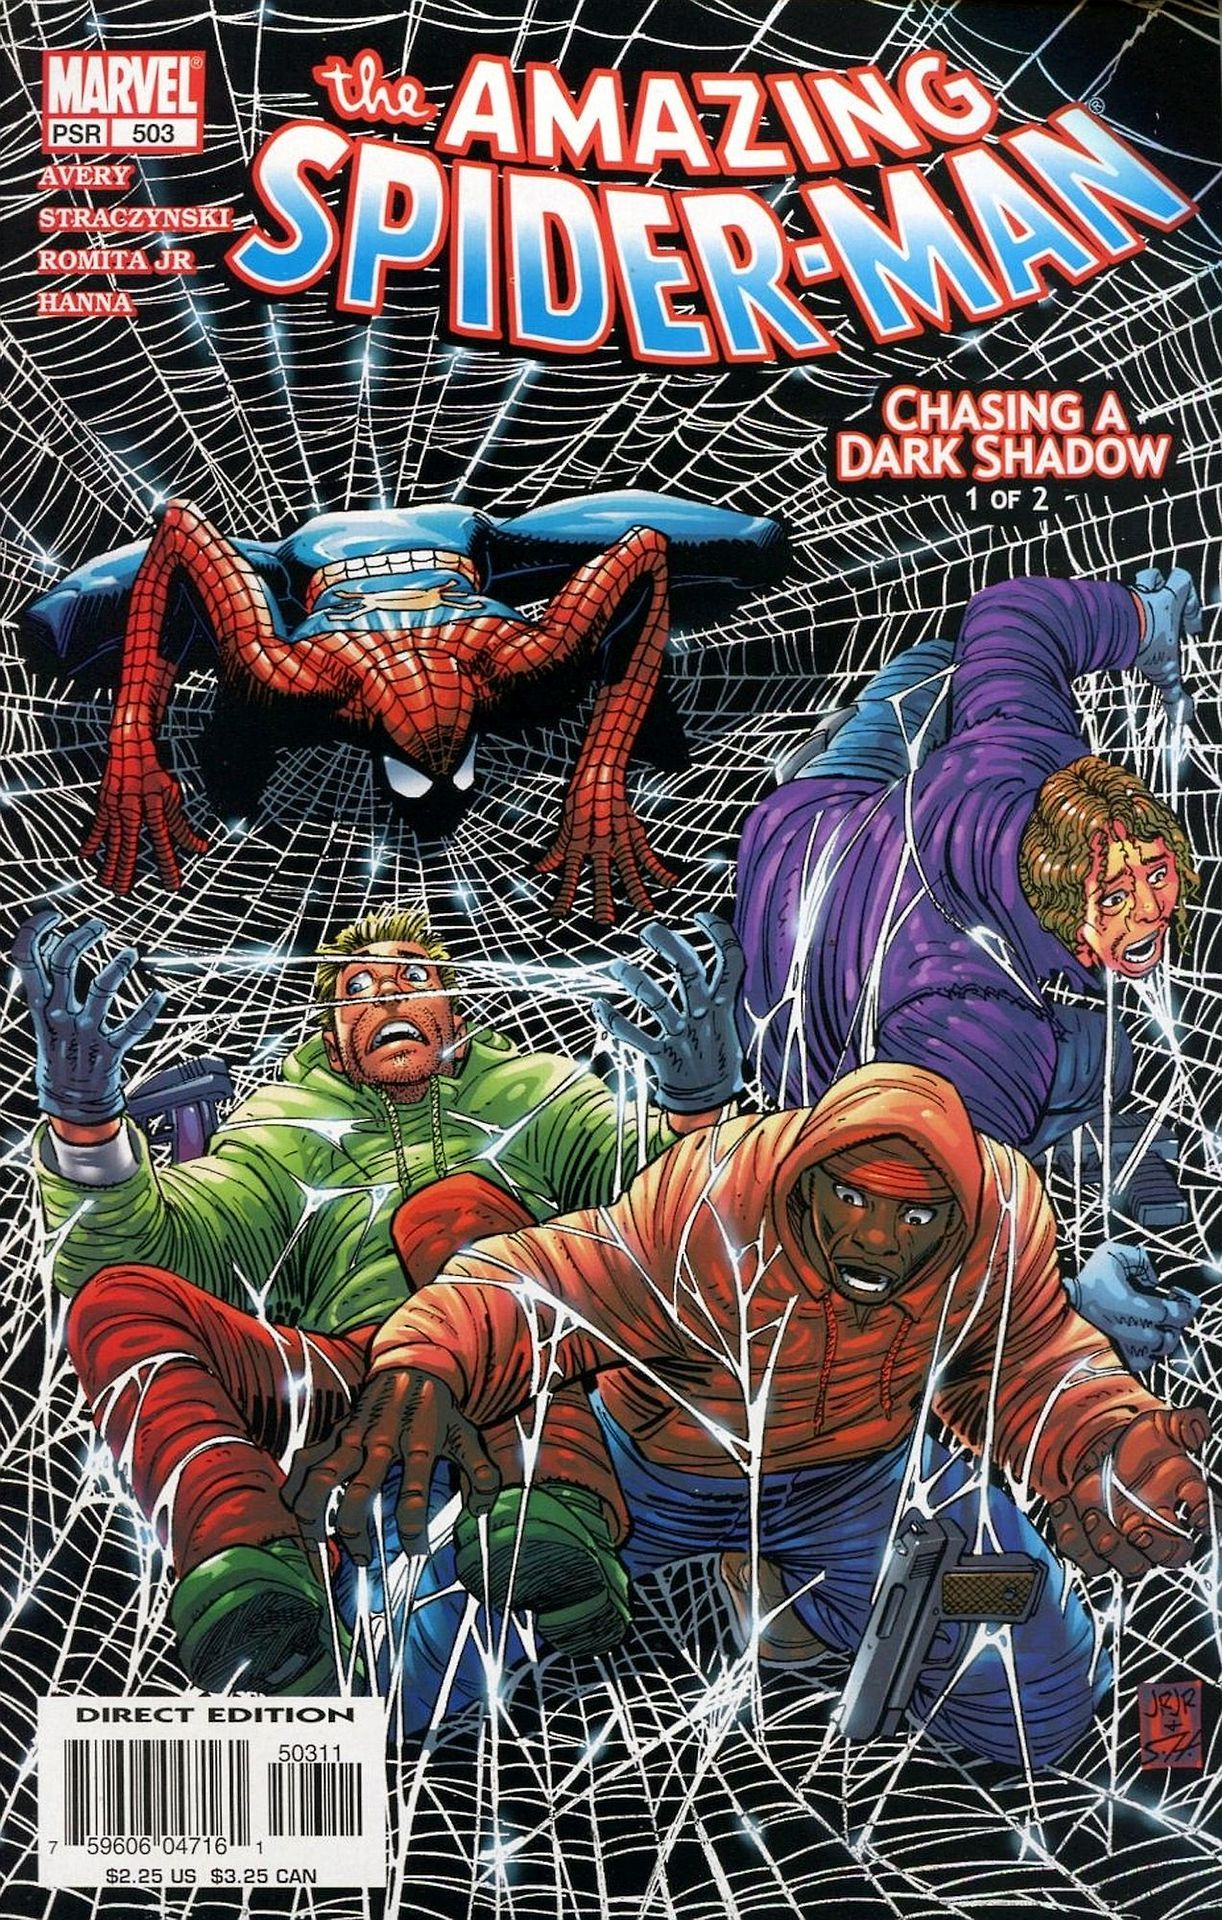 the Amazing Spider-Man, Vol. 1 # 503, by John Romita, Jr., Scott Hanna, and Matt Milla.